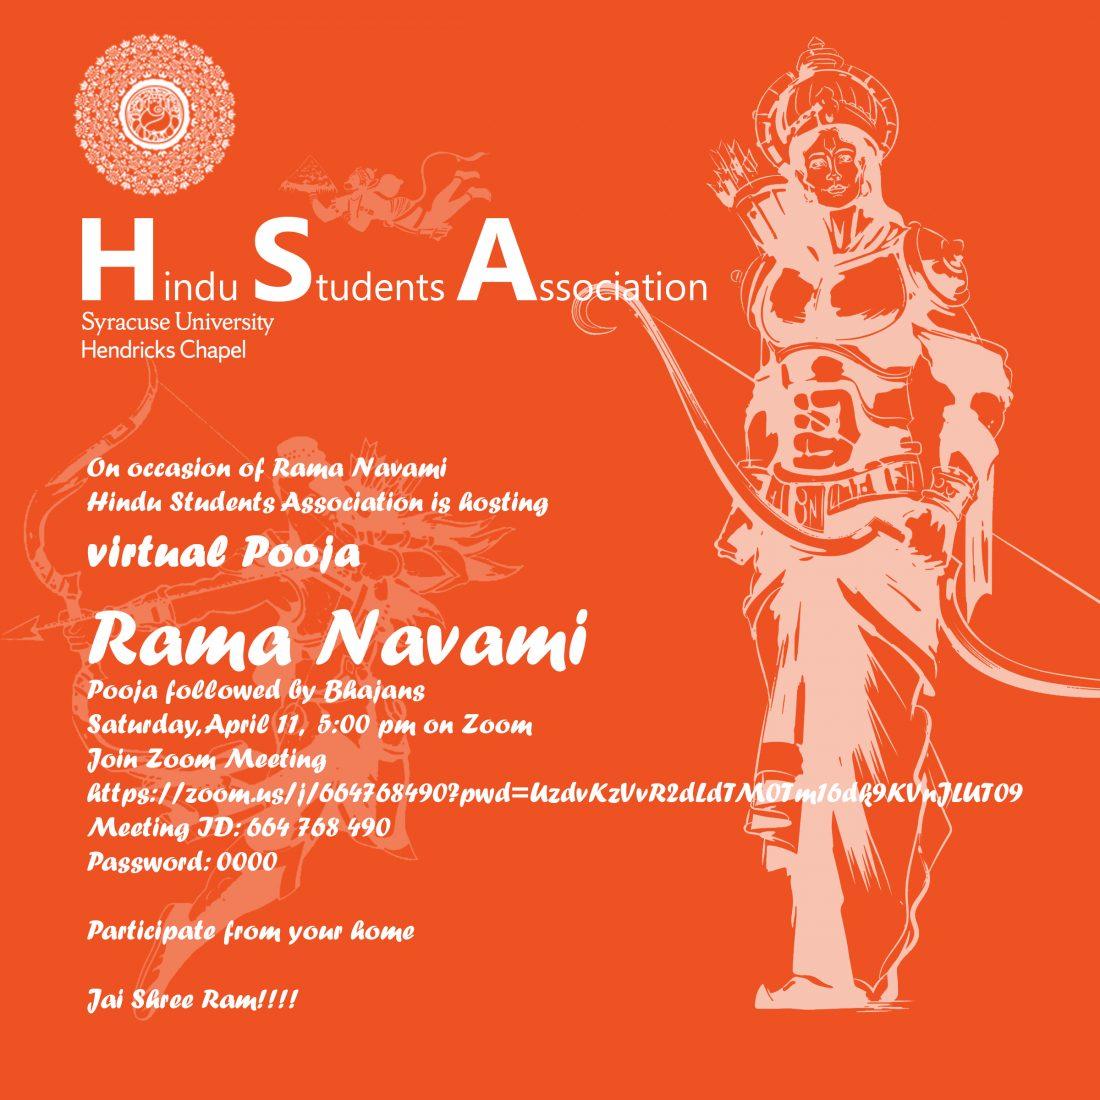 Rama Navami Pooja